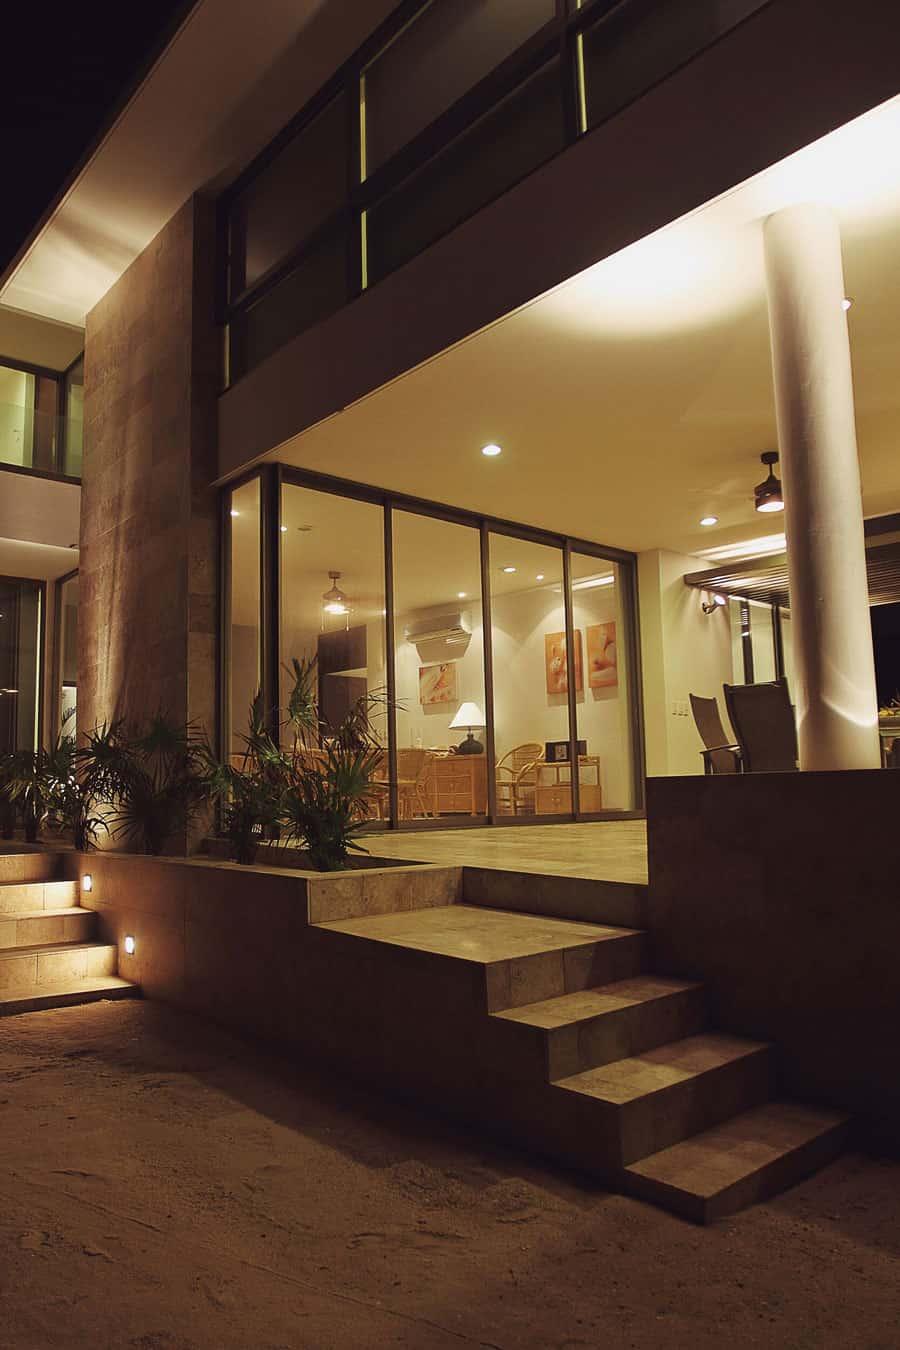 Tuunich Kanab by Seijo Peon Arquitectos (14)